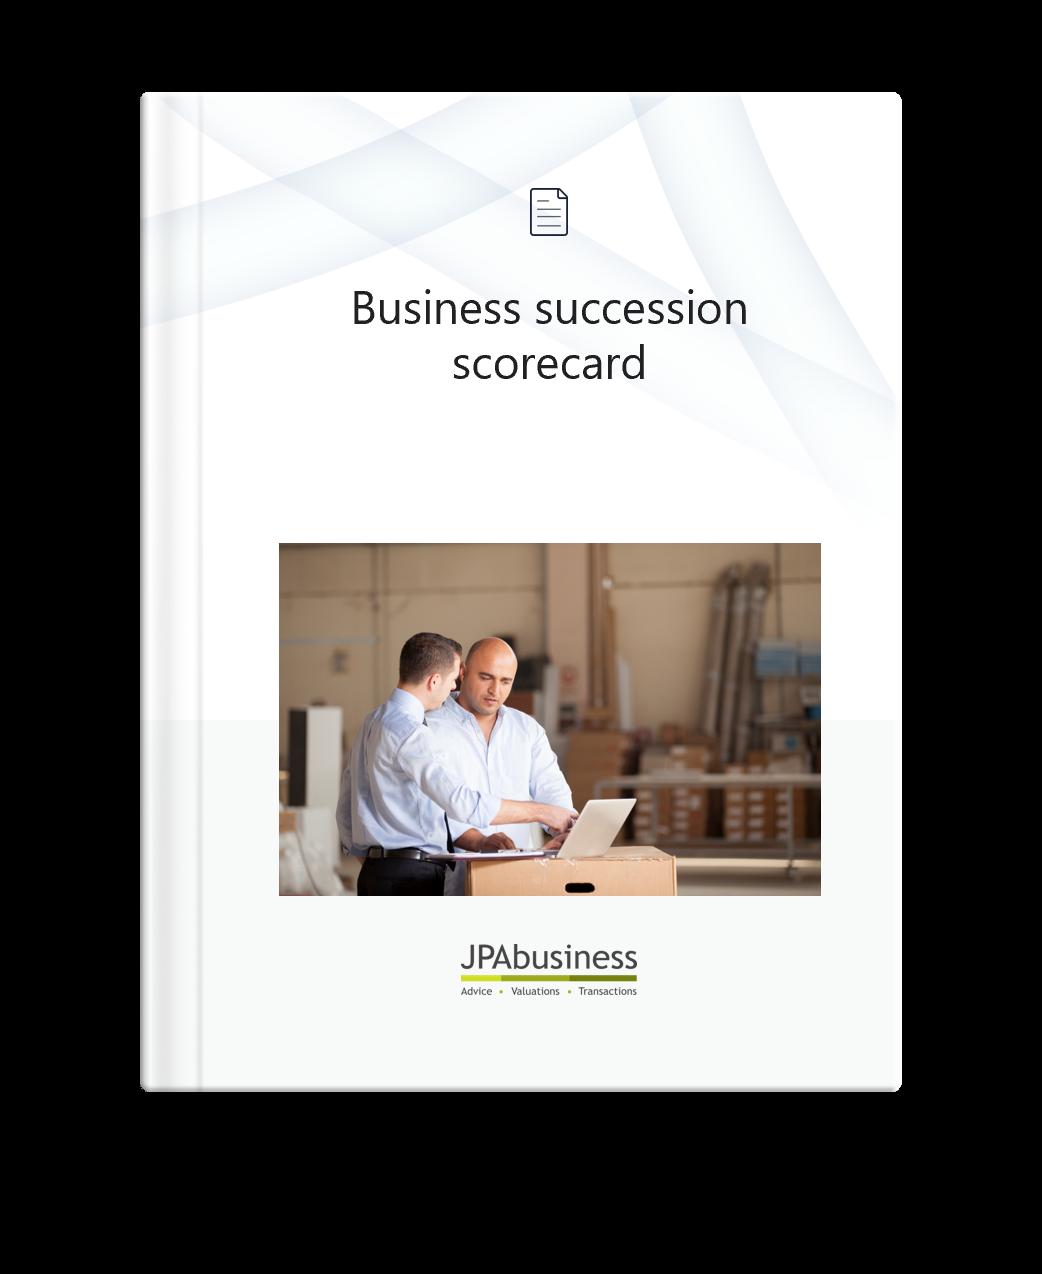 Business Succession Scorecard | JPAbusiness